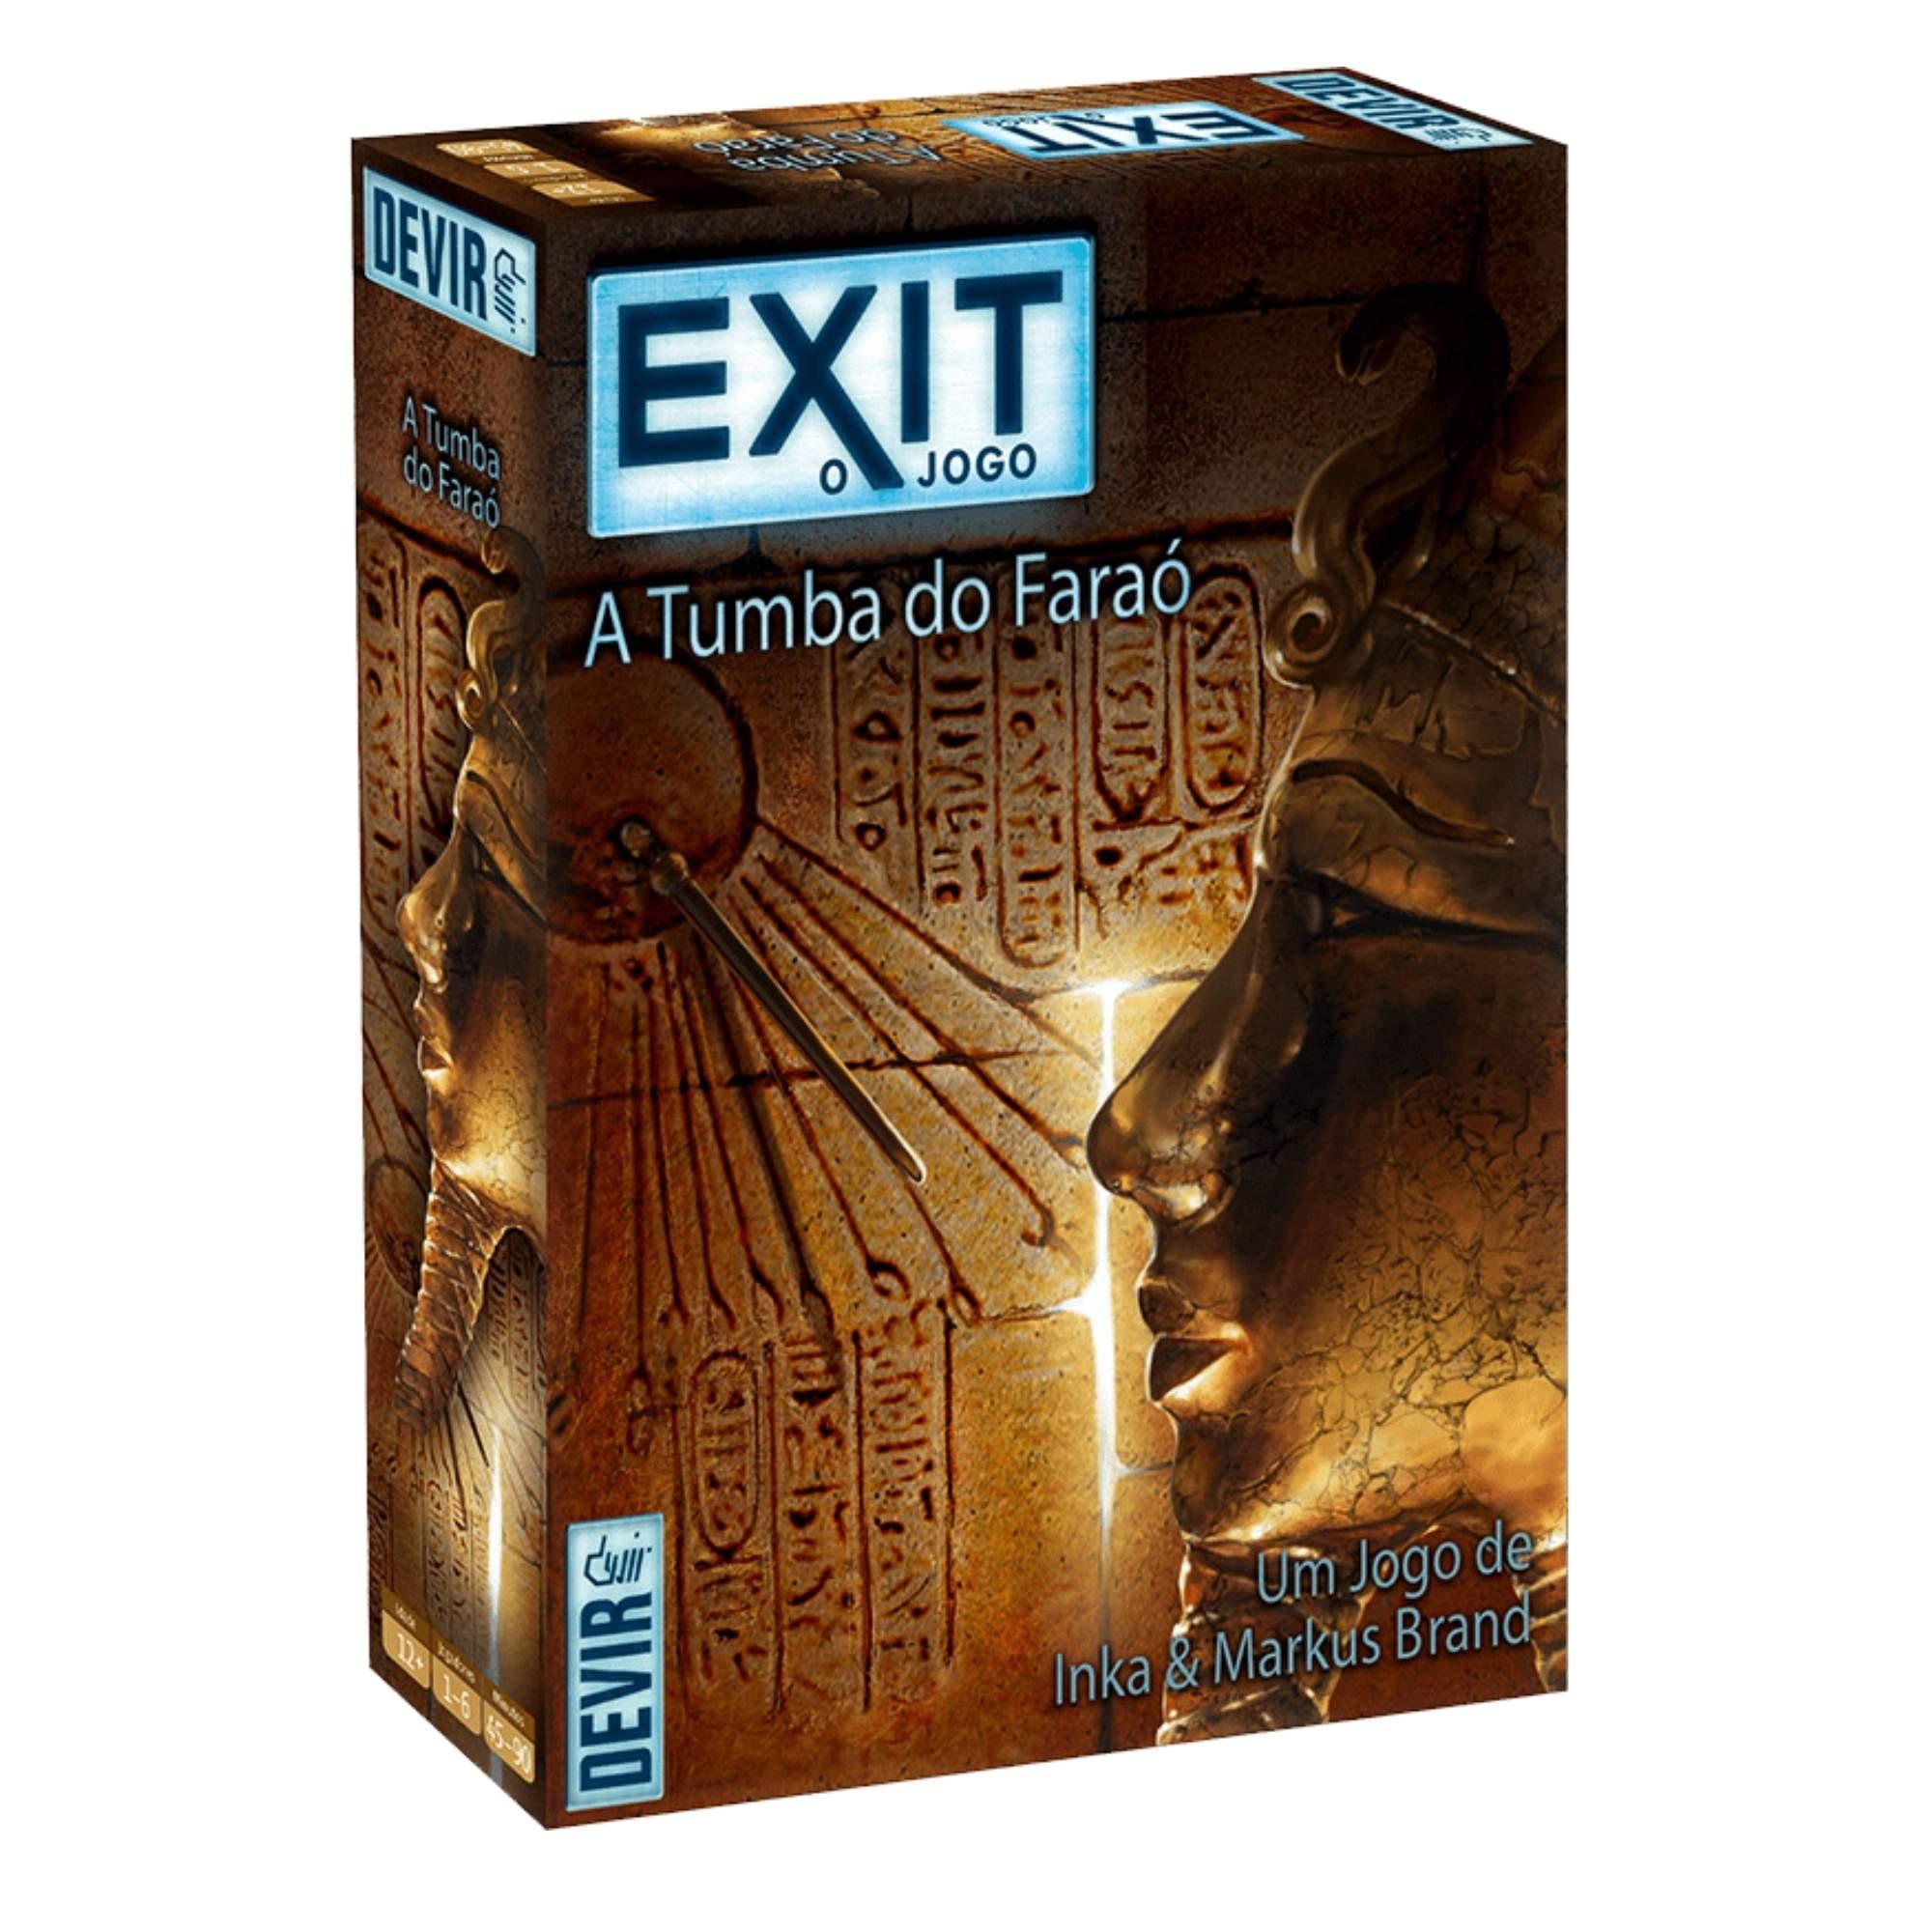 Exit, A Tumba do Faraó